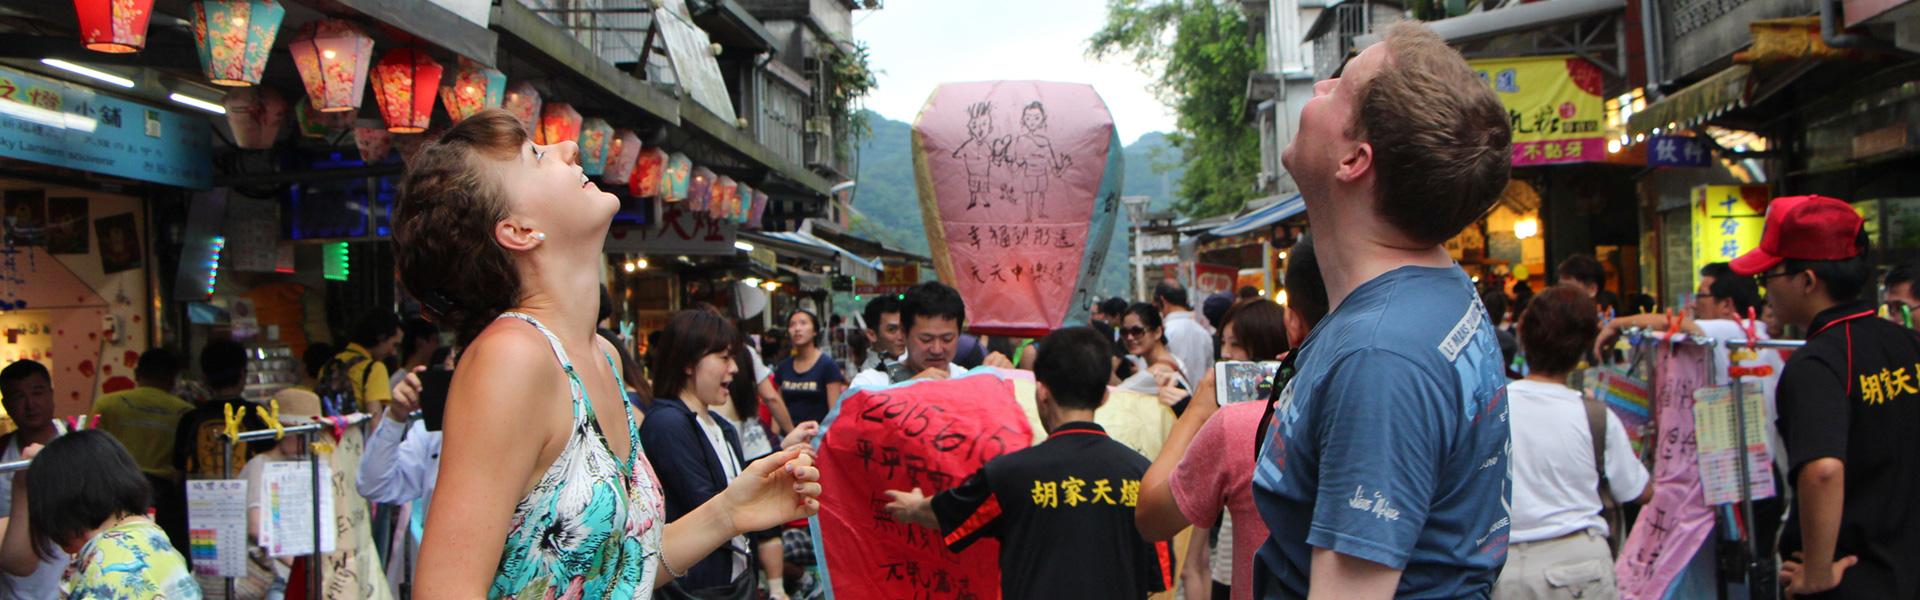 Taiwan Customized couple Tours